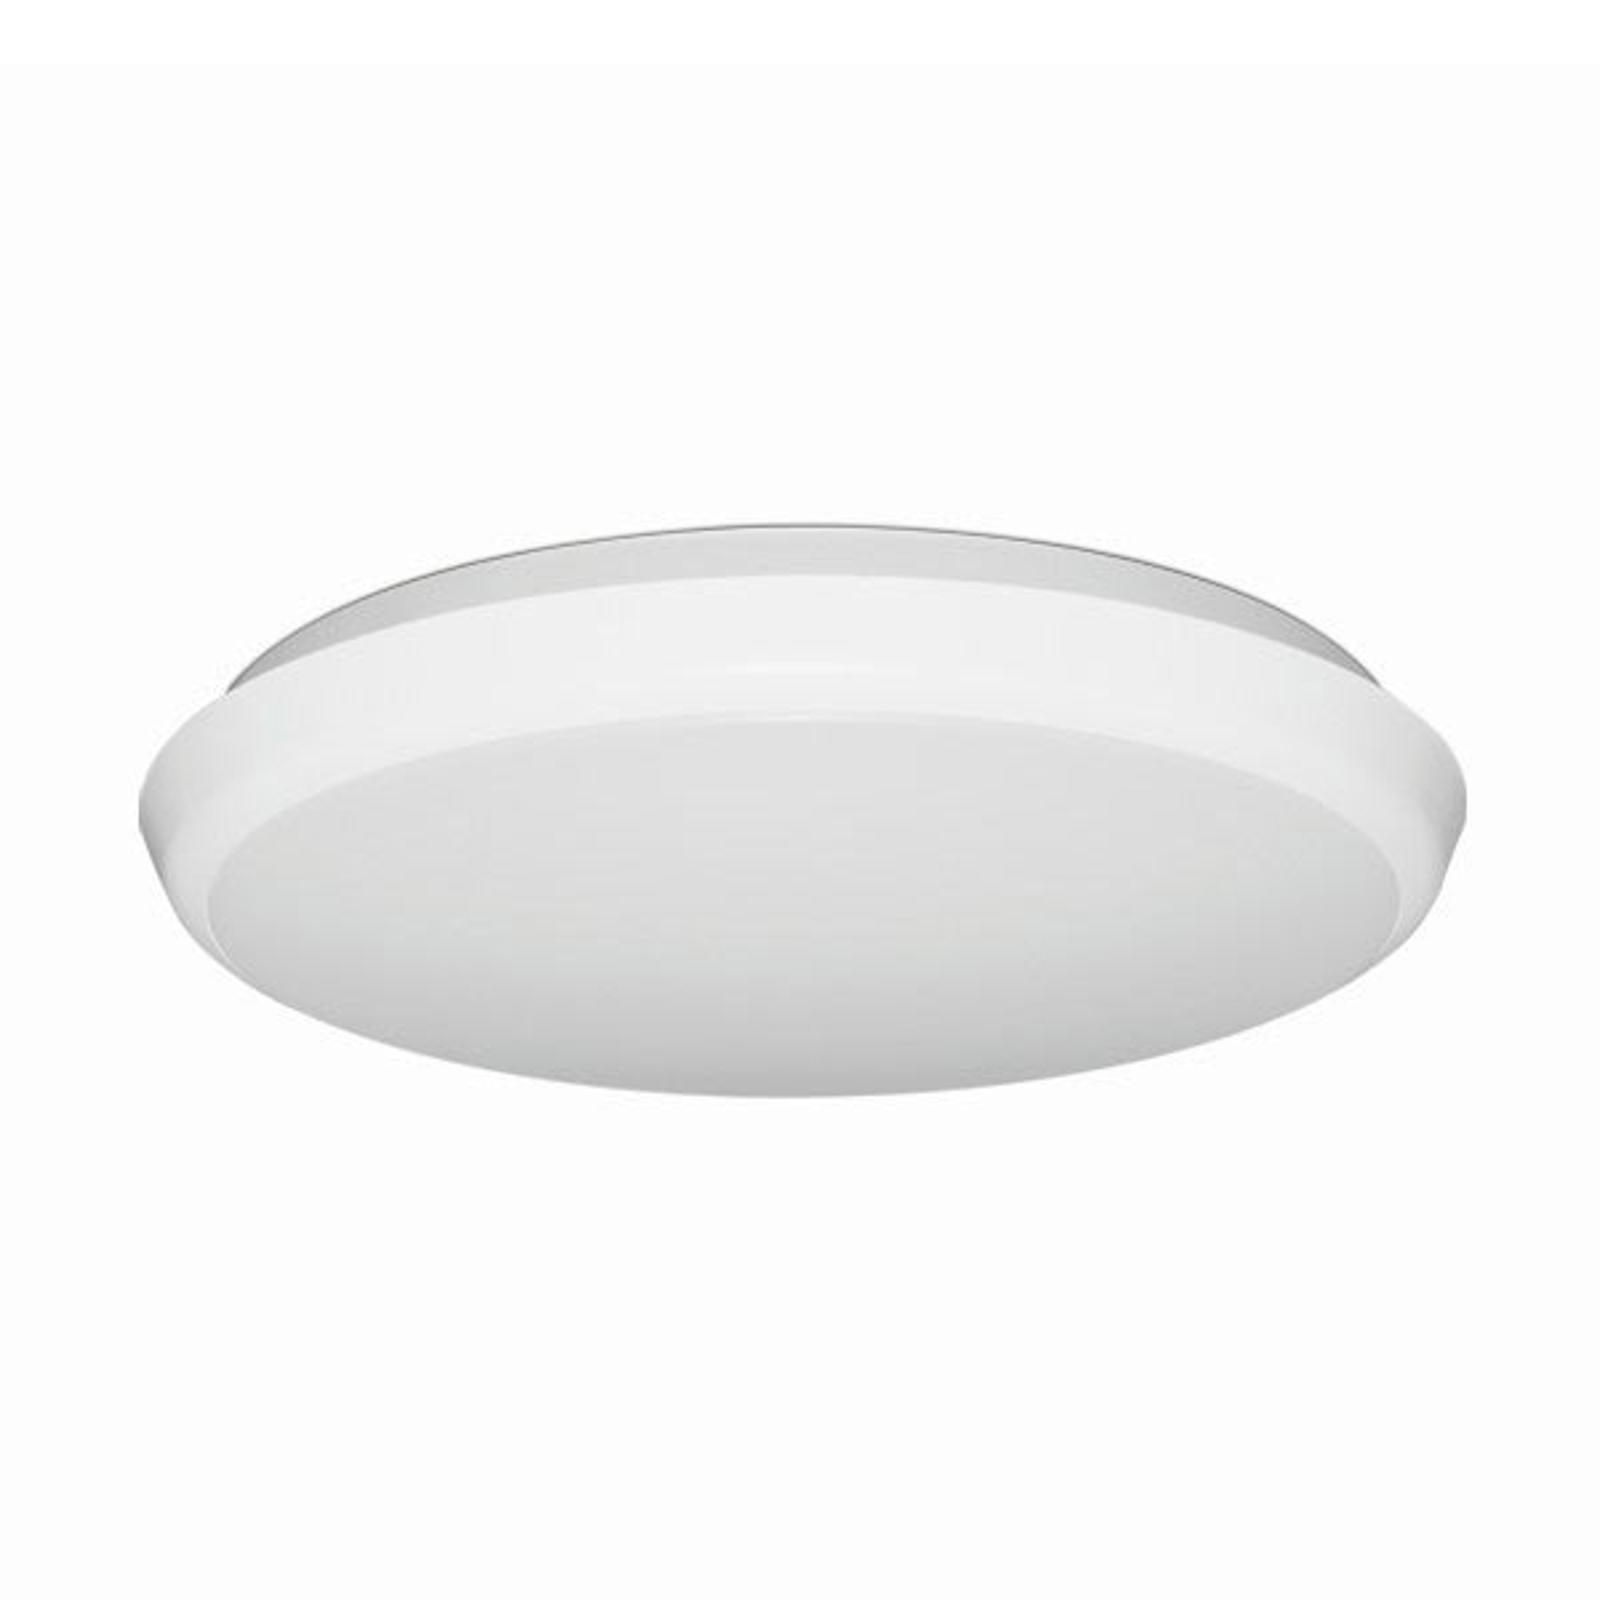 Zirra - dimbare LED plafondlamp met sensor, IP54